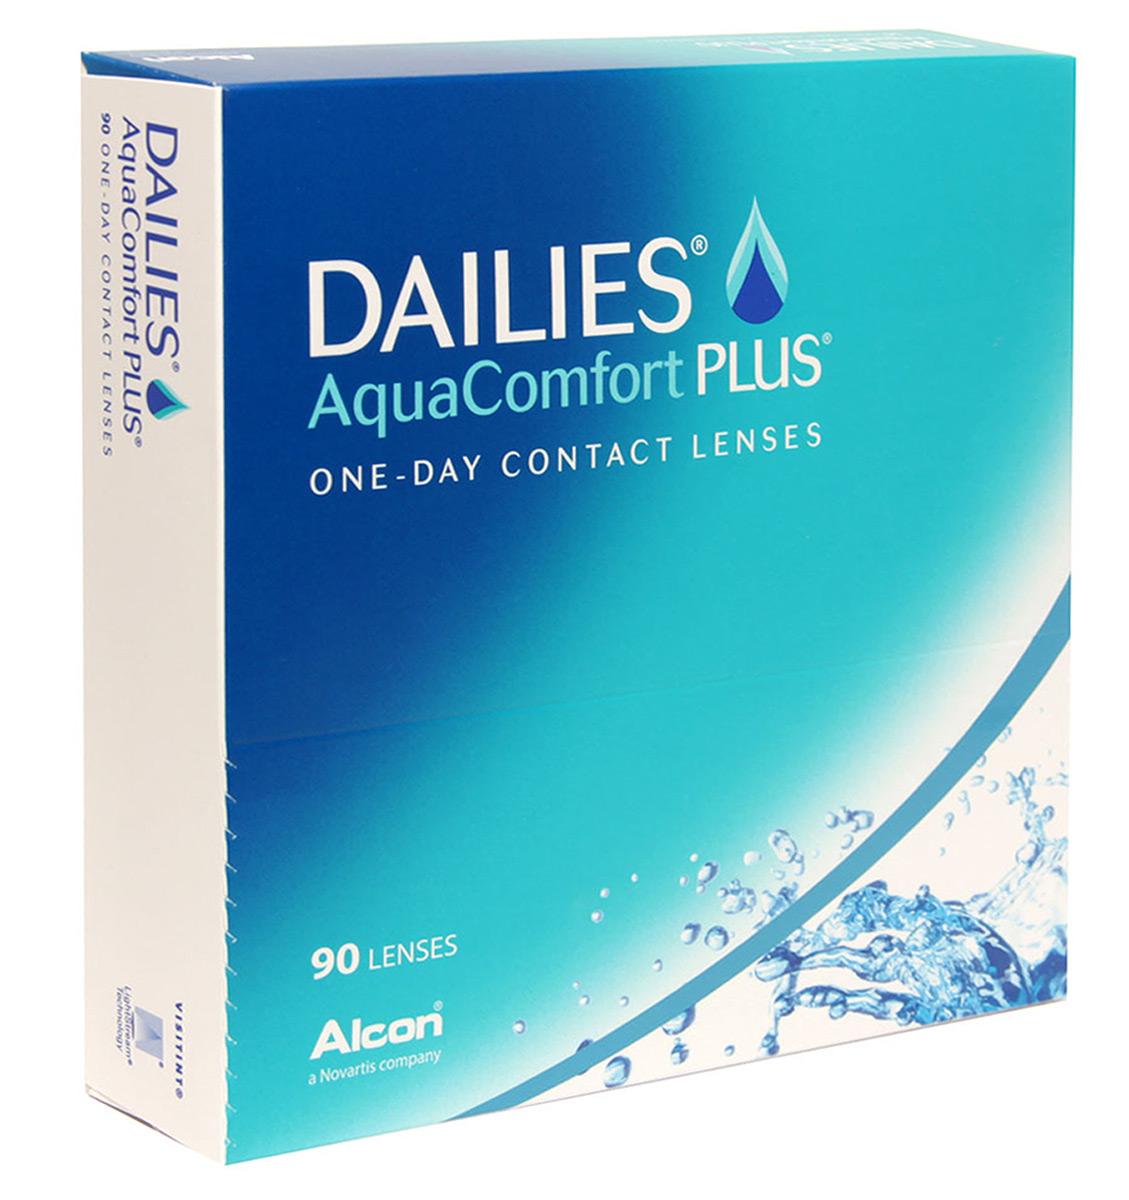 Alcon-CIBA Vision контактные линзы Dailies AquaComfort Plus (90шт / 8.7 / 14.0 / -5.50)